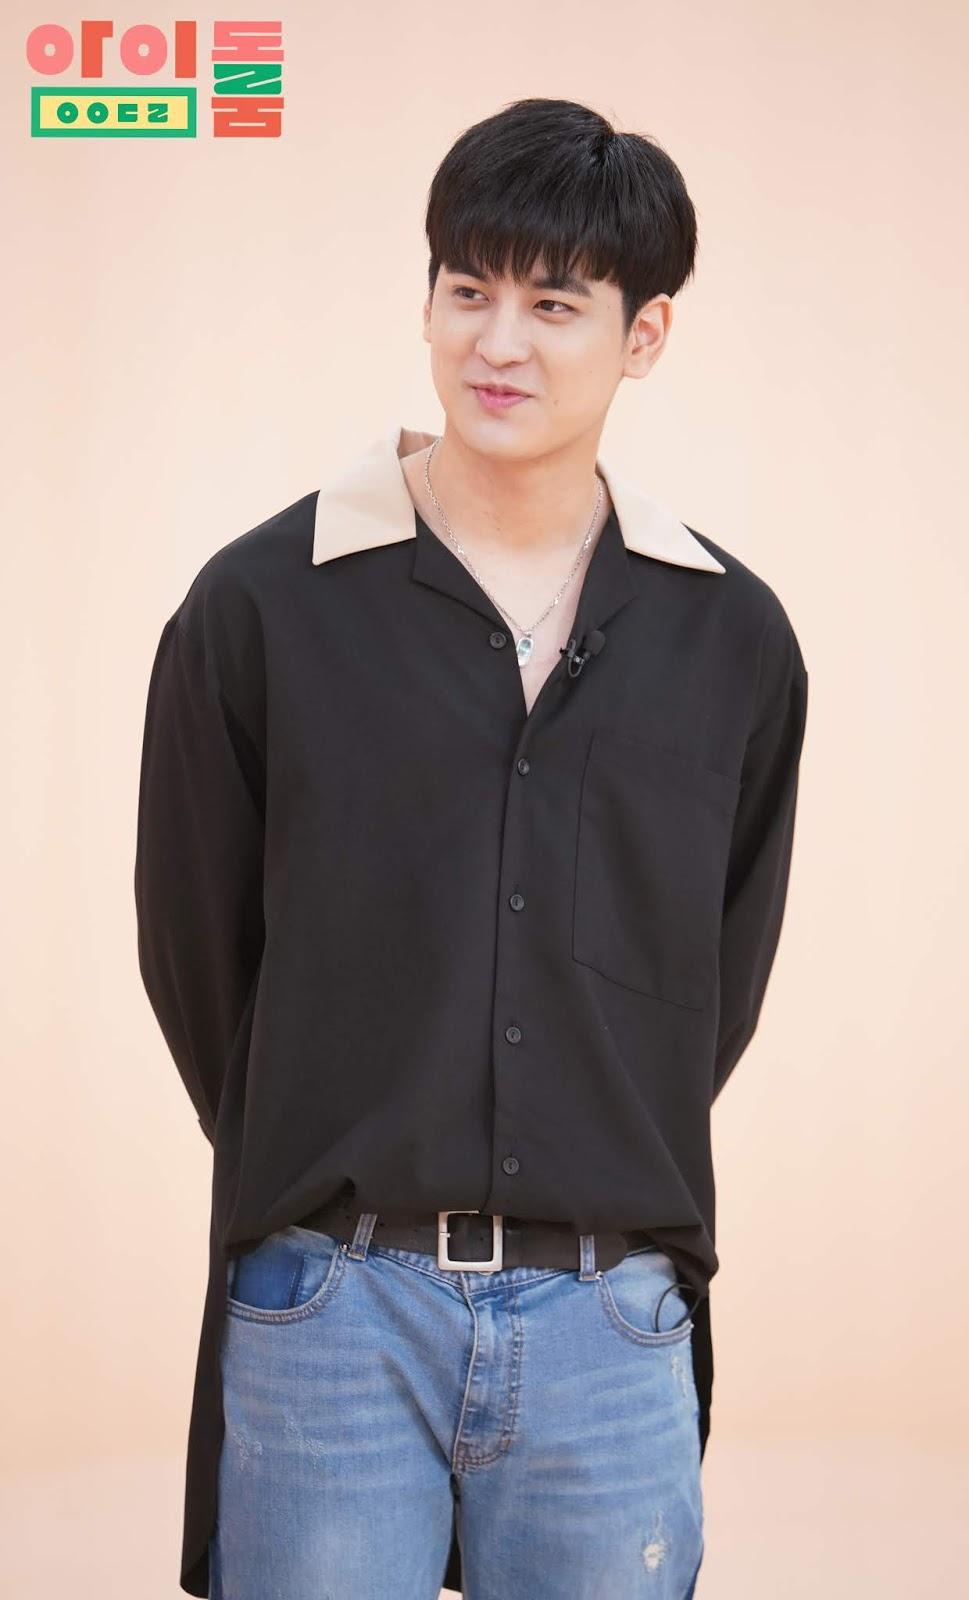 JTBC Idol Room iKON English Sub - 아이돌룸 - iKON Updates